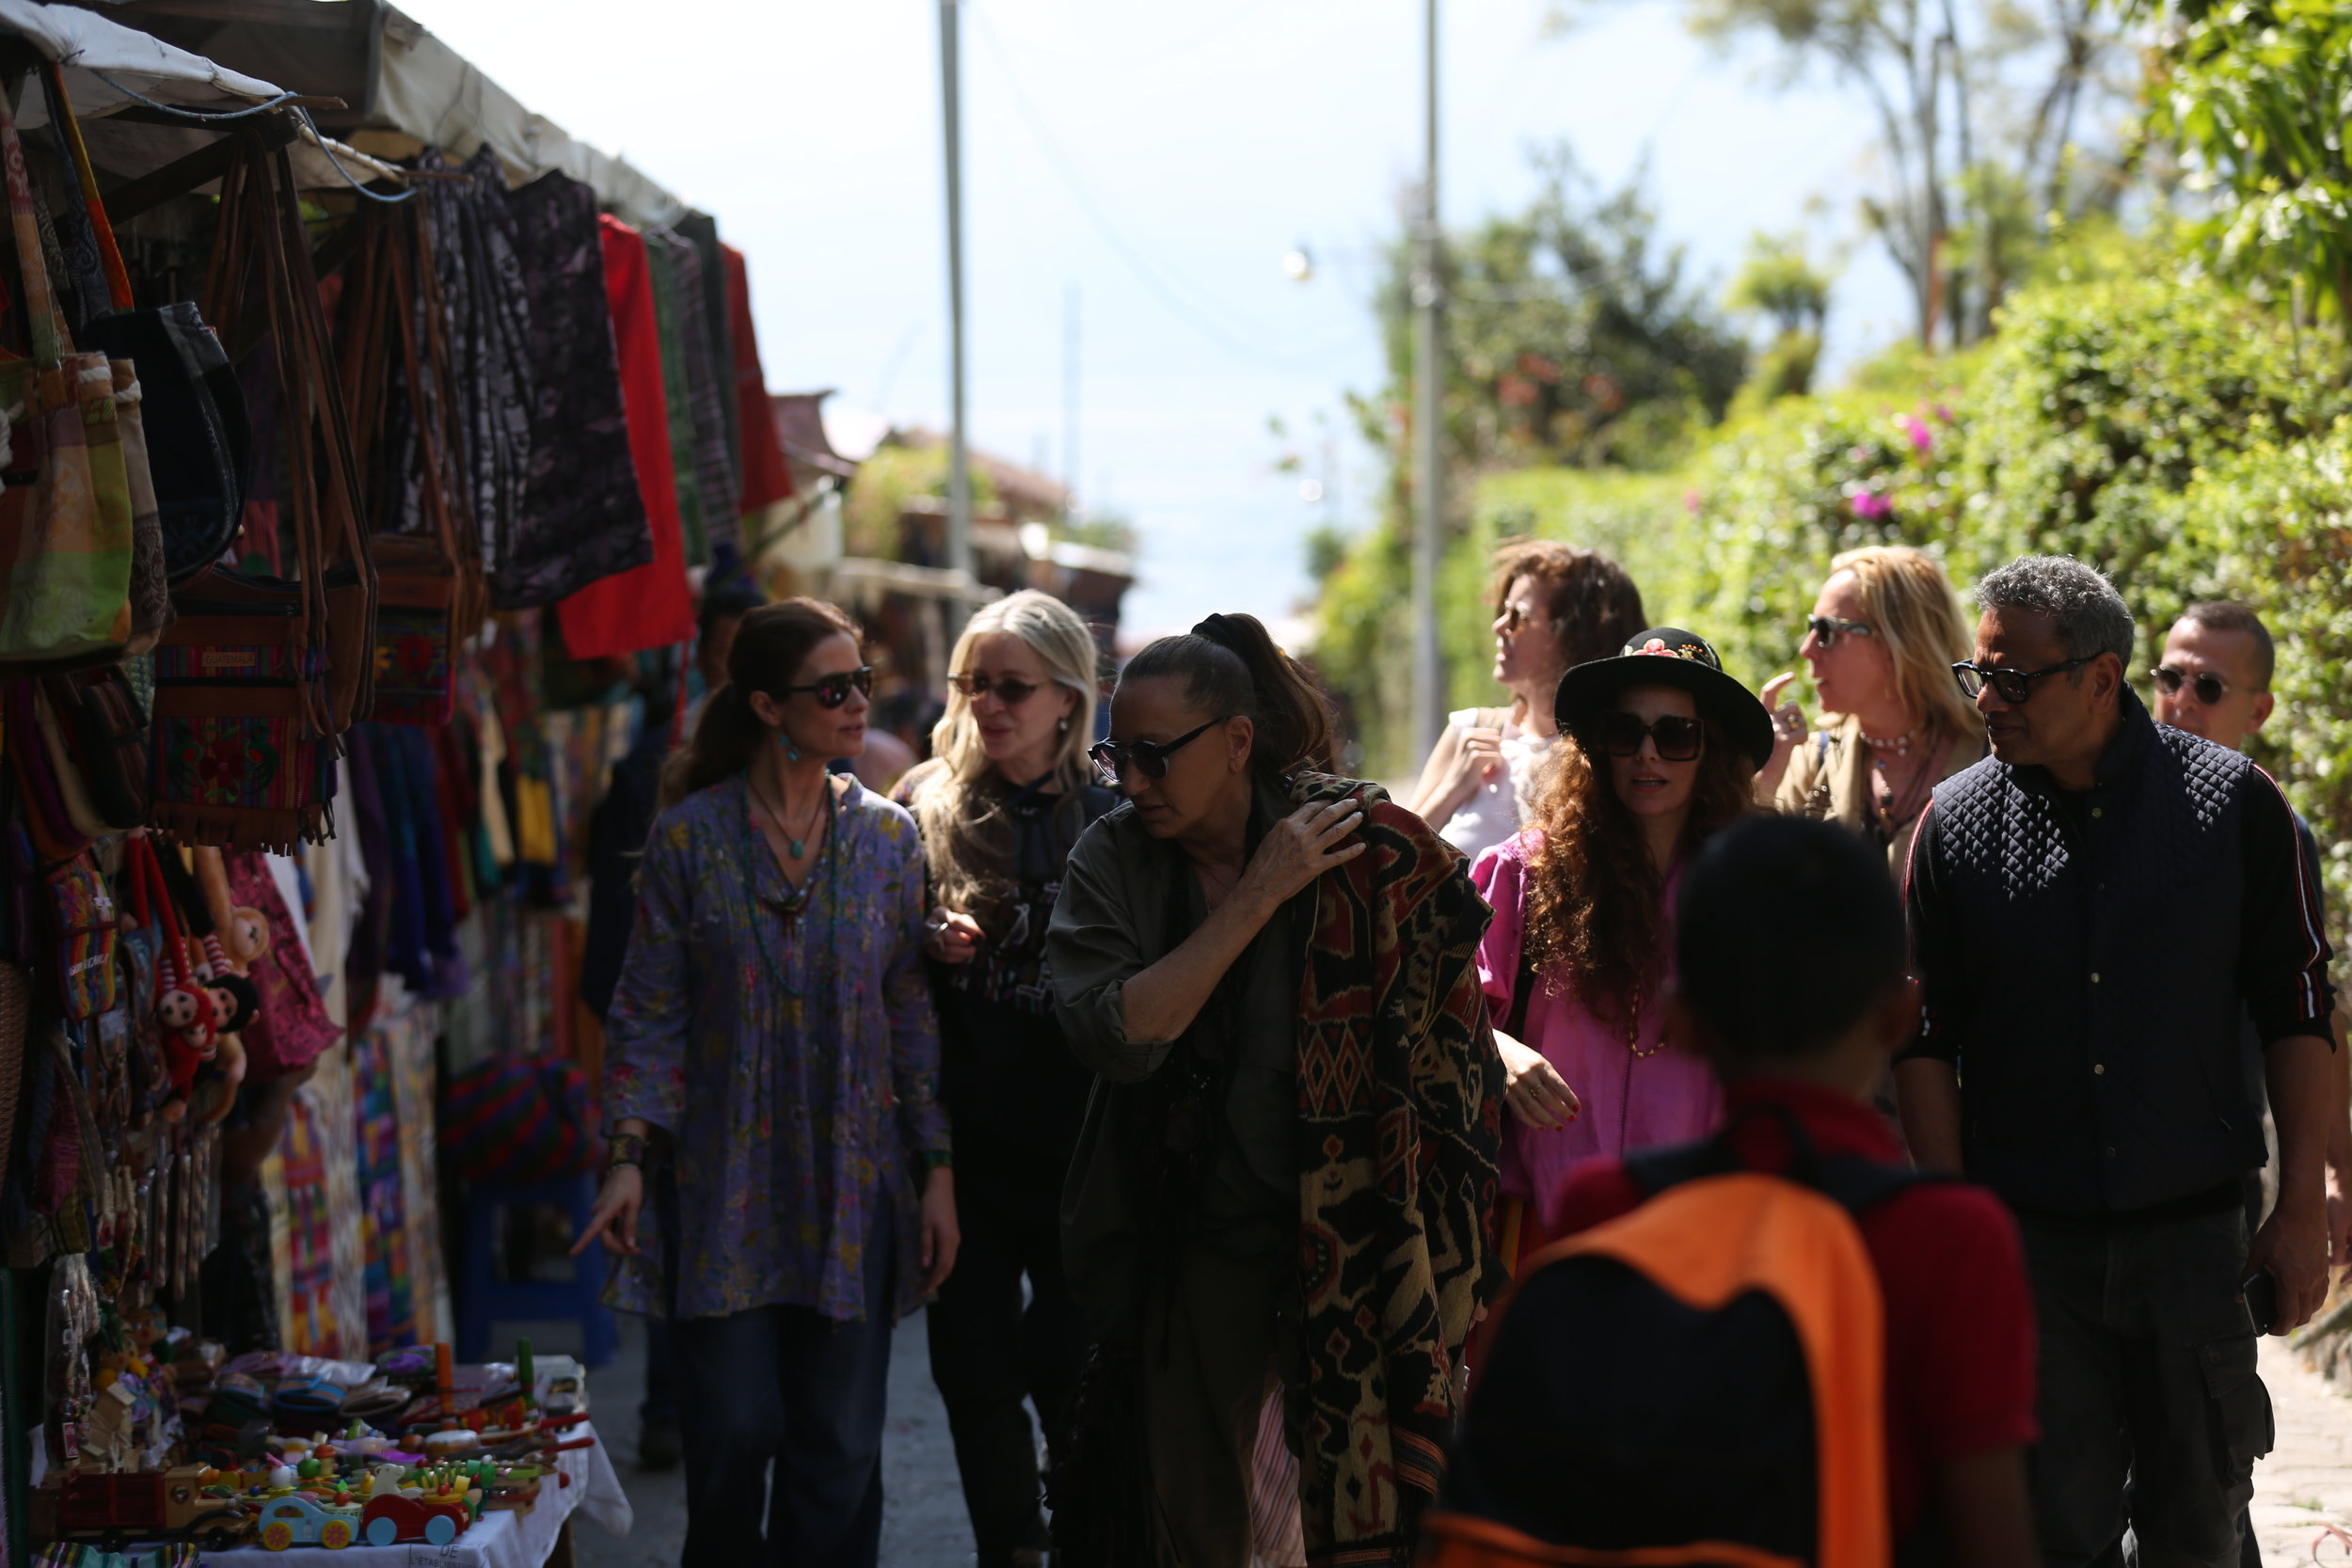 Livia with Carmen and Donna Karan visiting one of Guatemala's rural artisan communities.